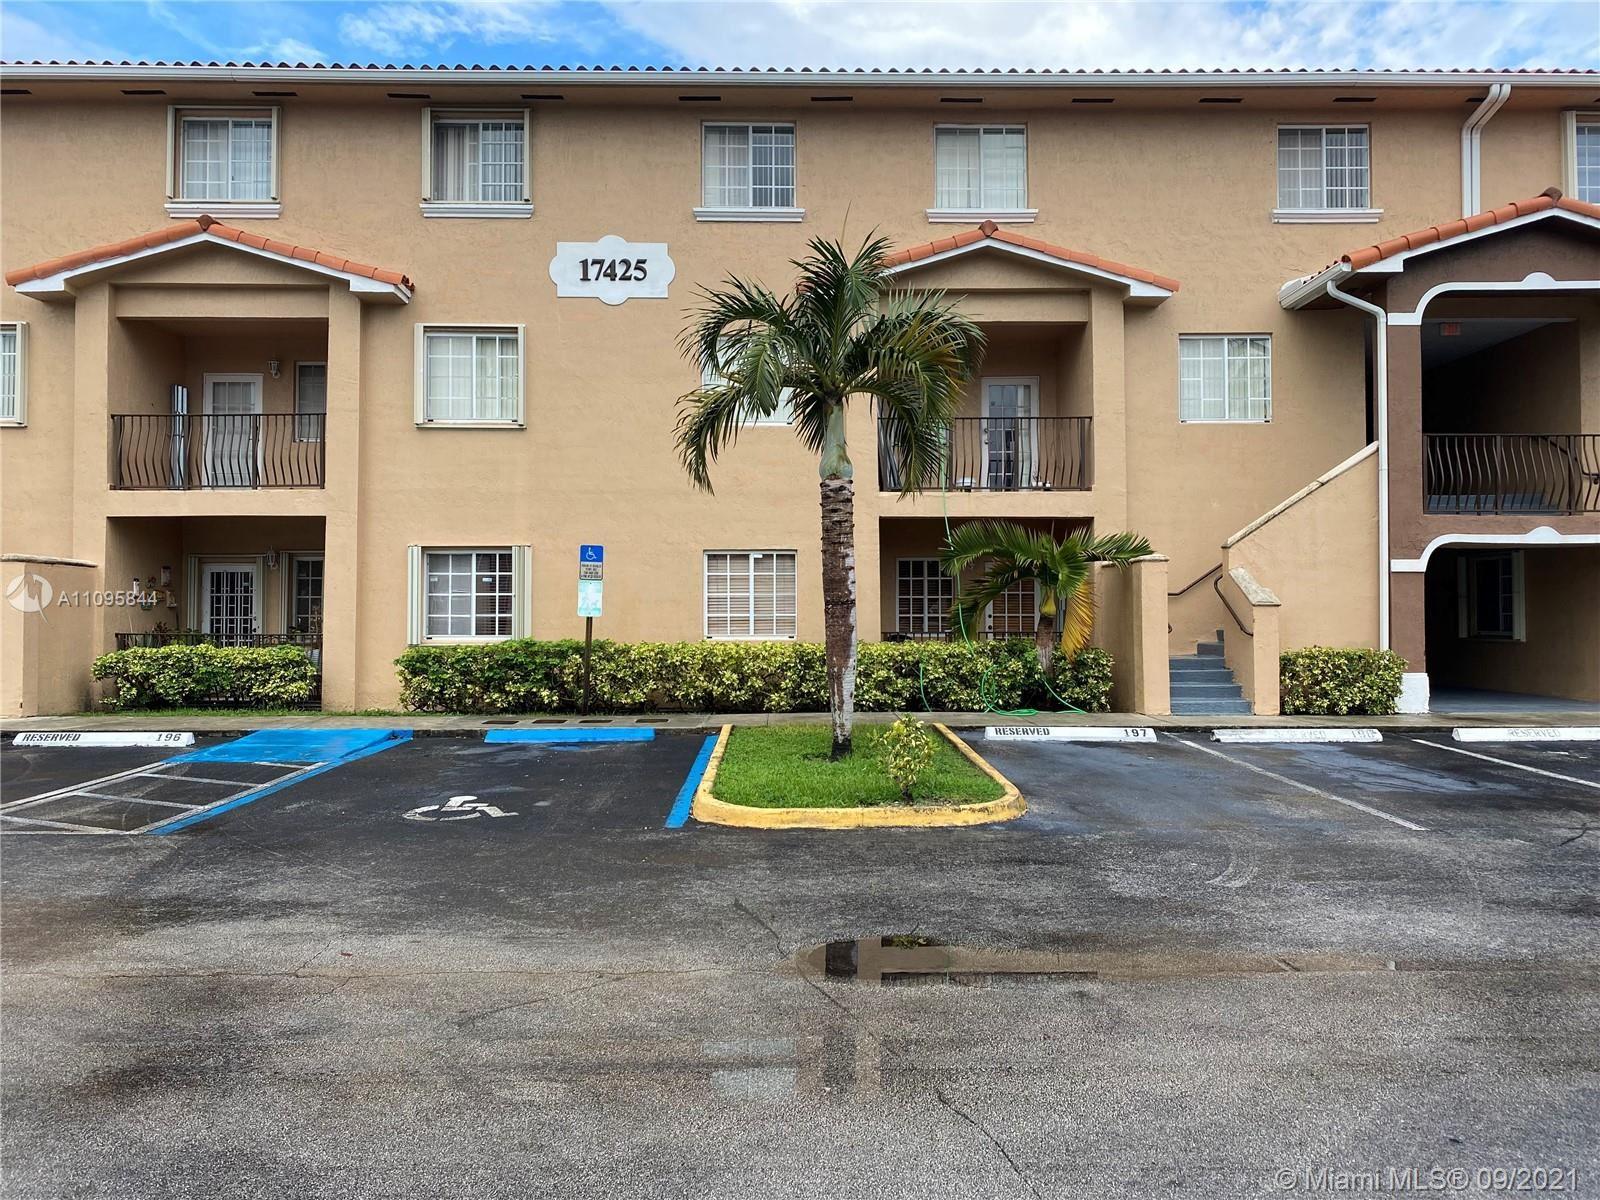 17425 NW 75th Pl #105, Hialeah, FL 33015 - #: A11095844